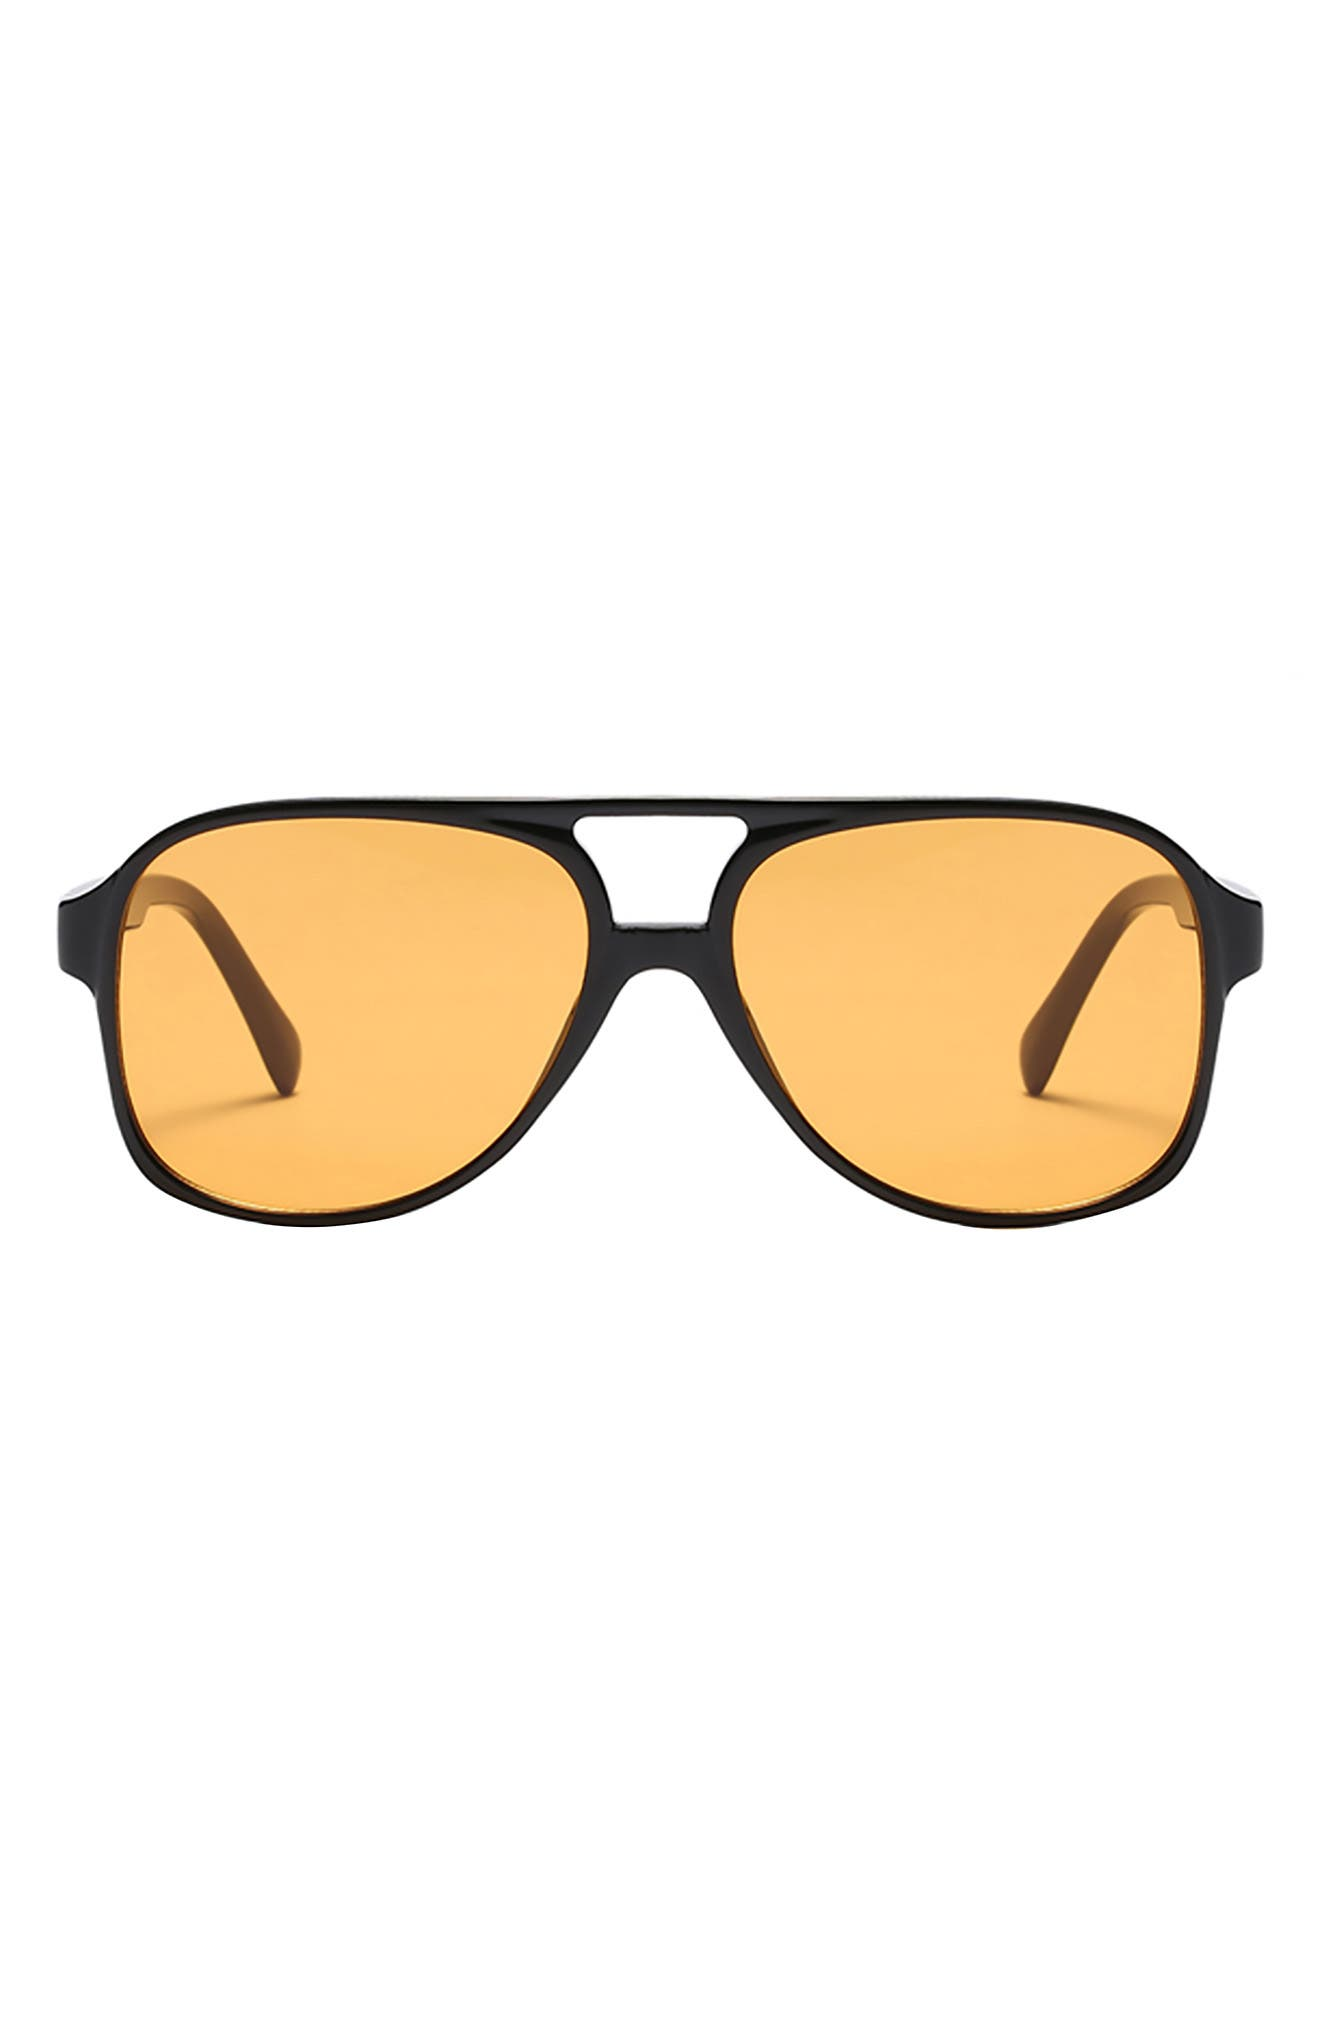 Kingston 60mm Aviator Sunglasses